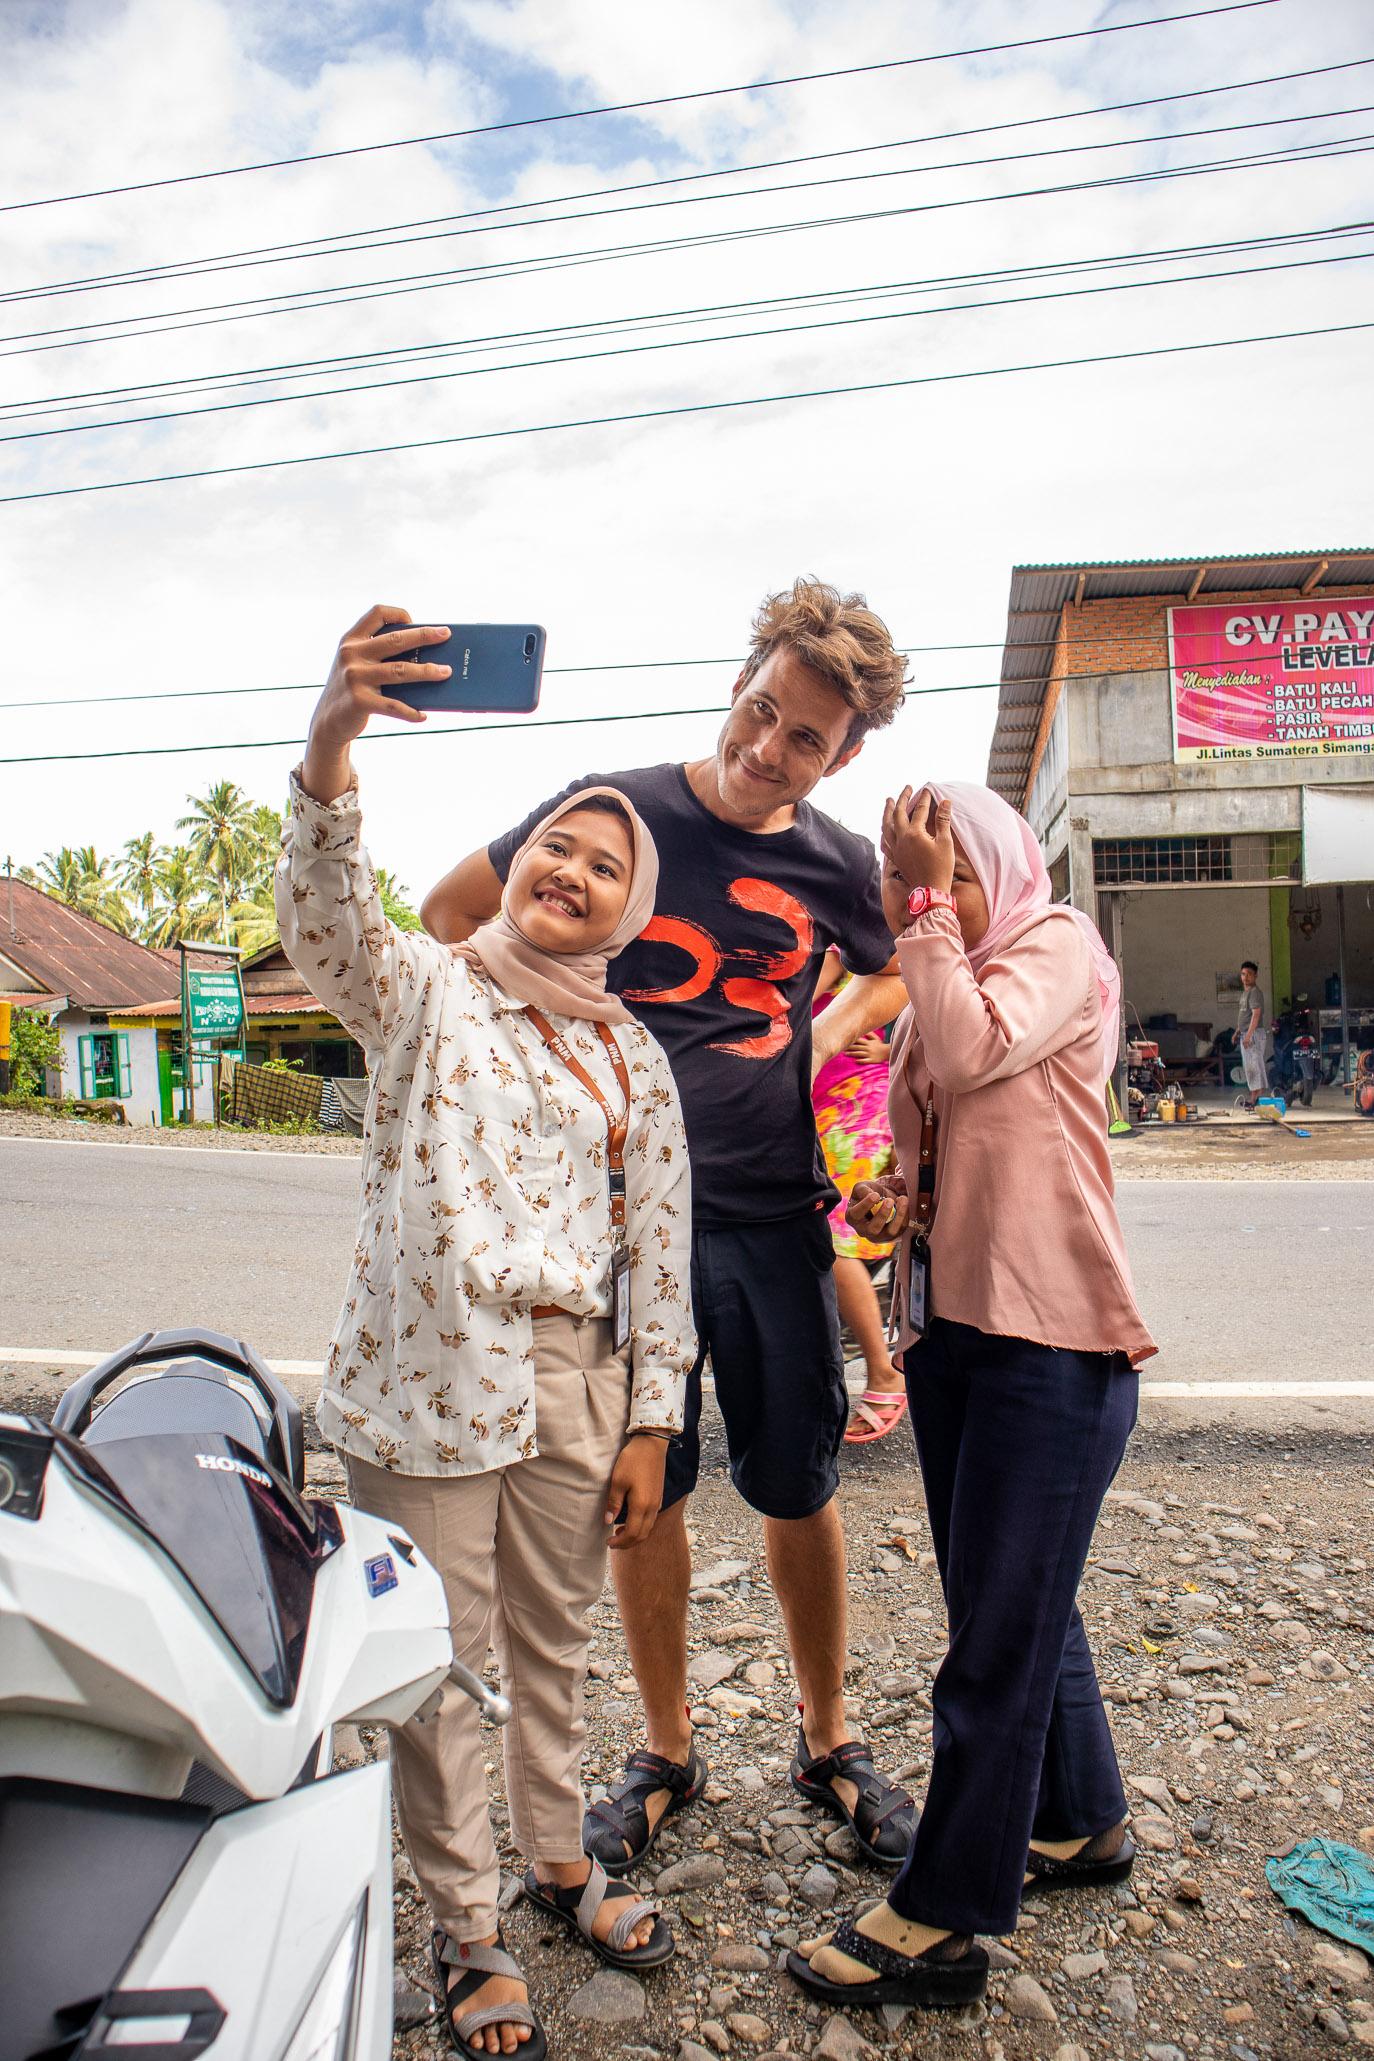 https://bubo.sk/uploads/galleries/7396/tomashornak_indonezia_sumatra_img_0244-1-3.jpg